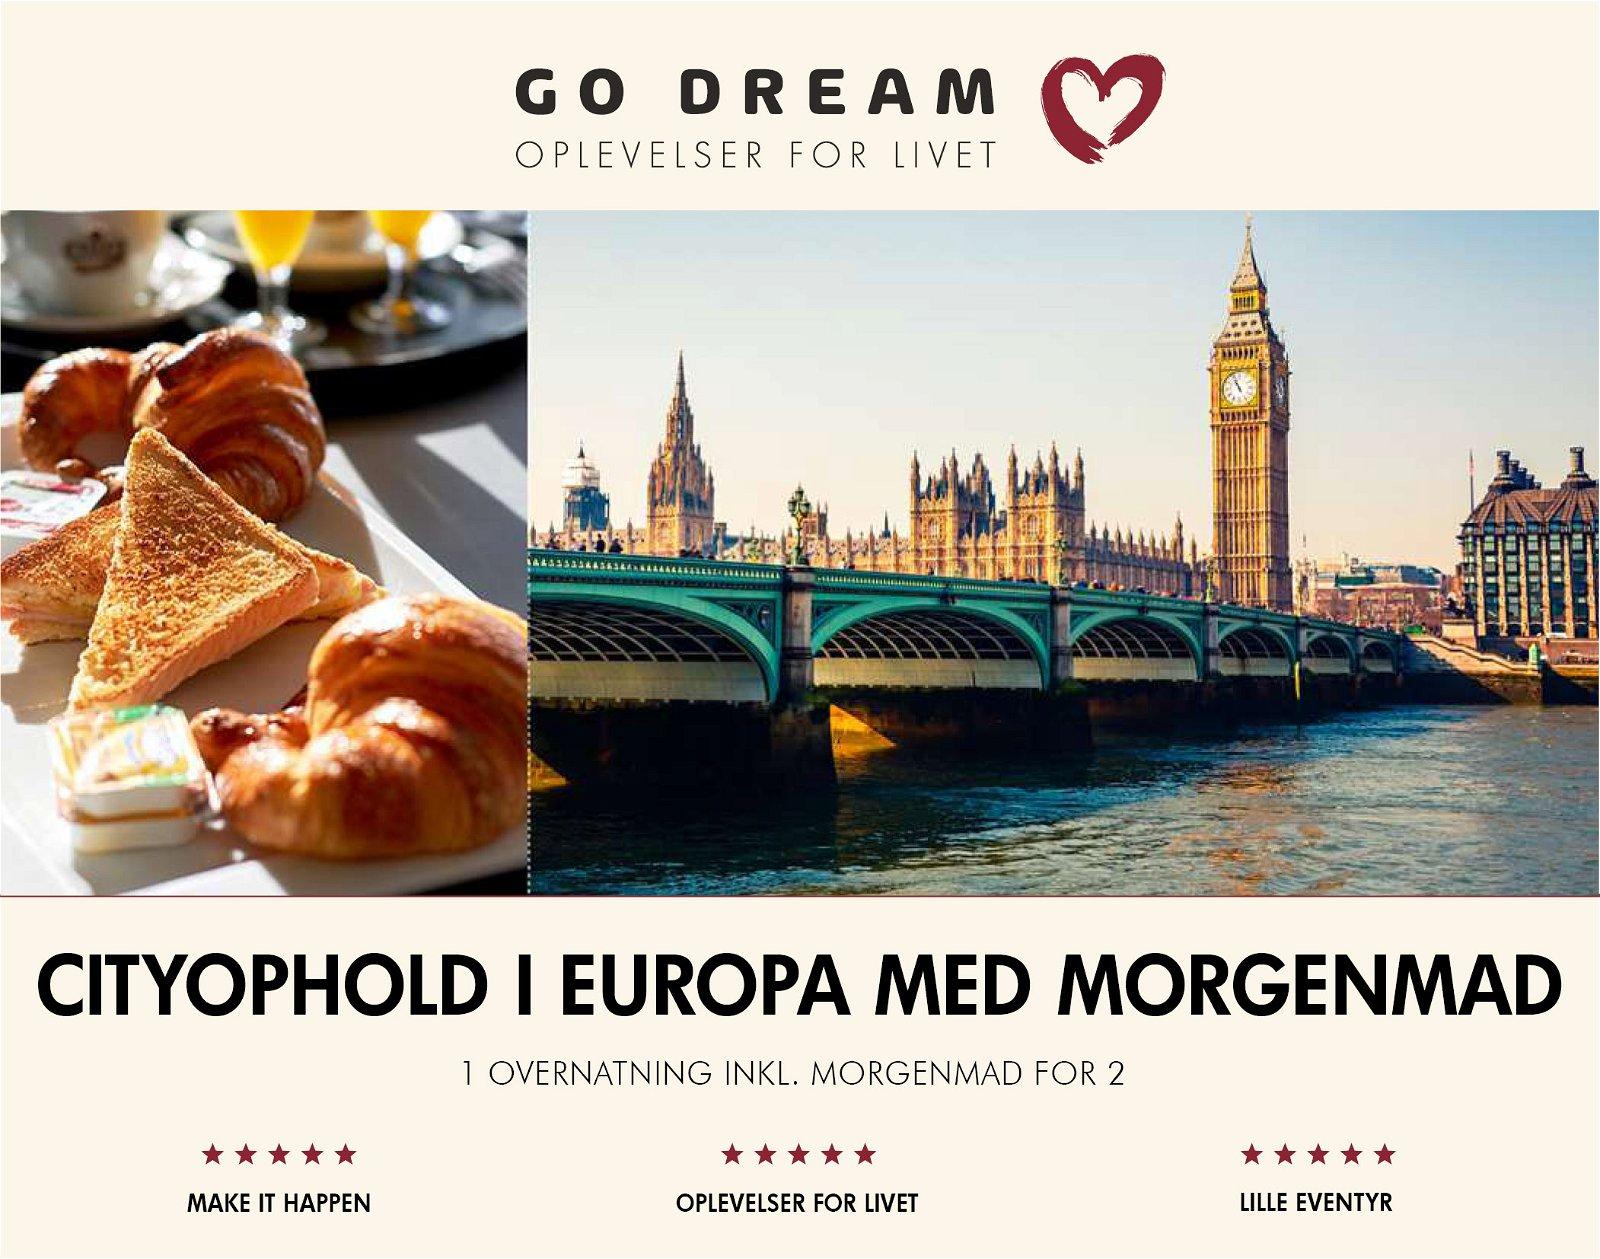 Go Dream Cityophold i Europa med morgenmad